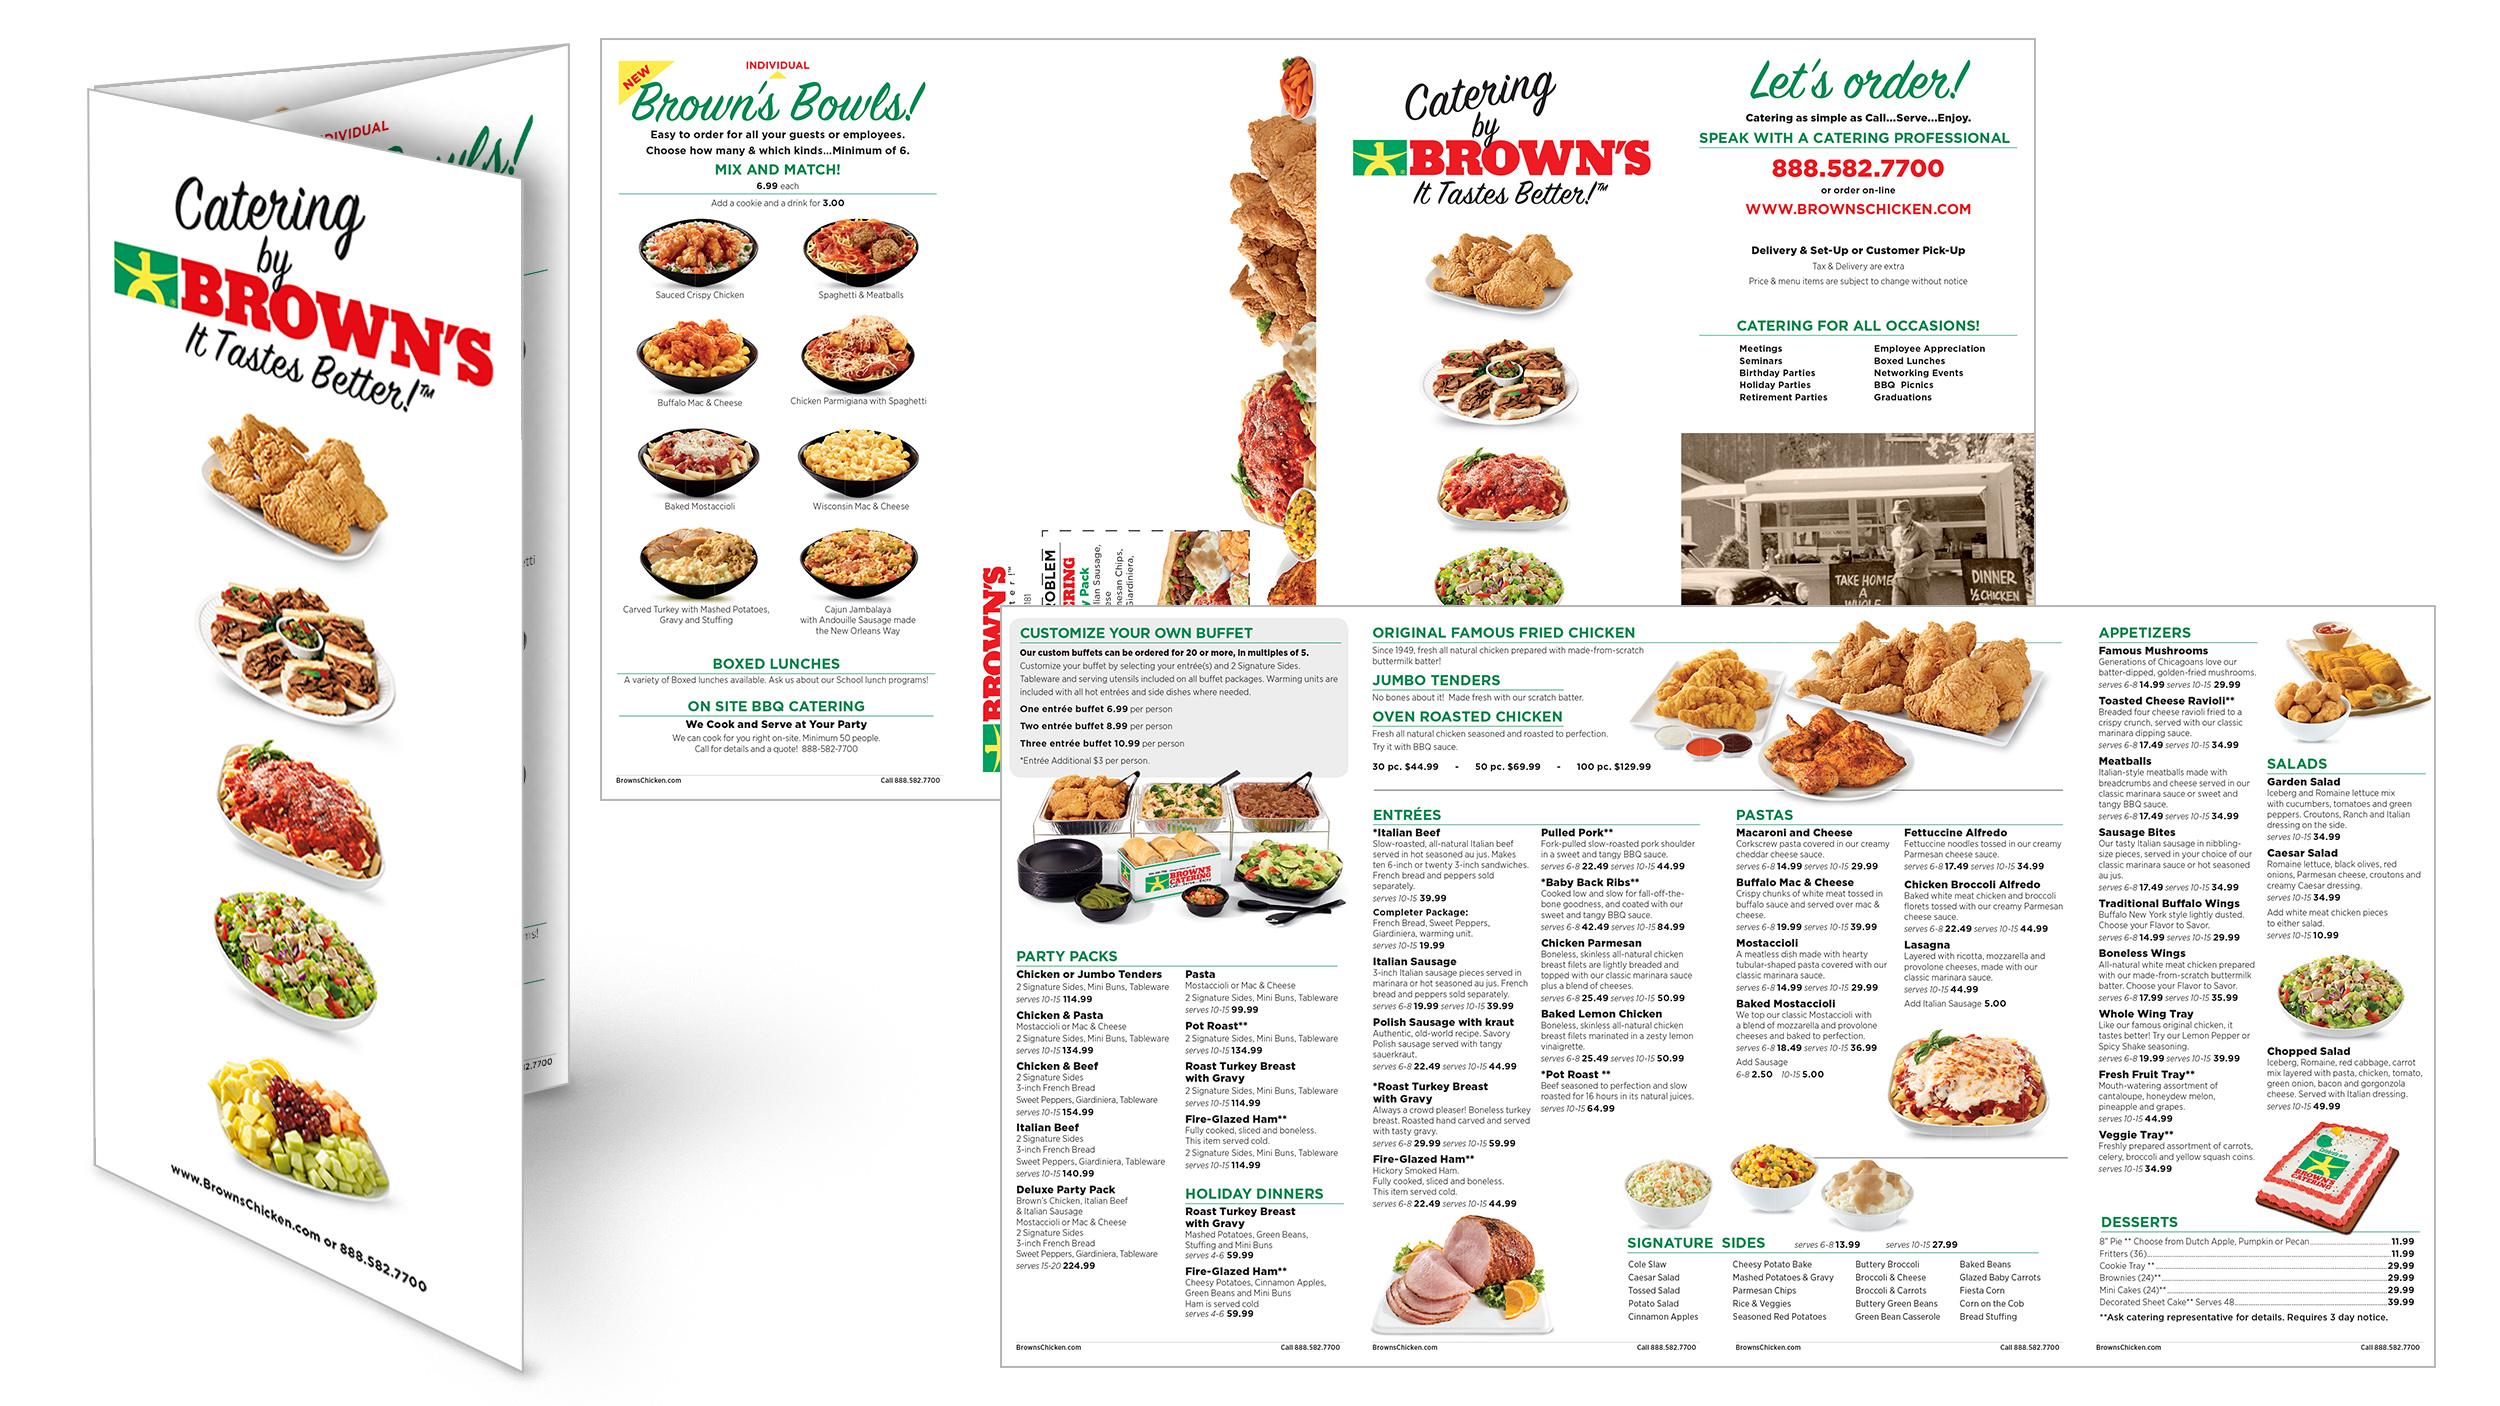 Browns-Catering-menu-Collateral-Material.jpg